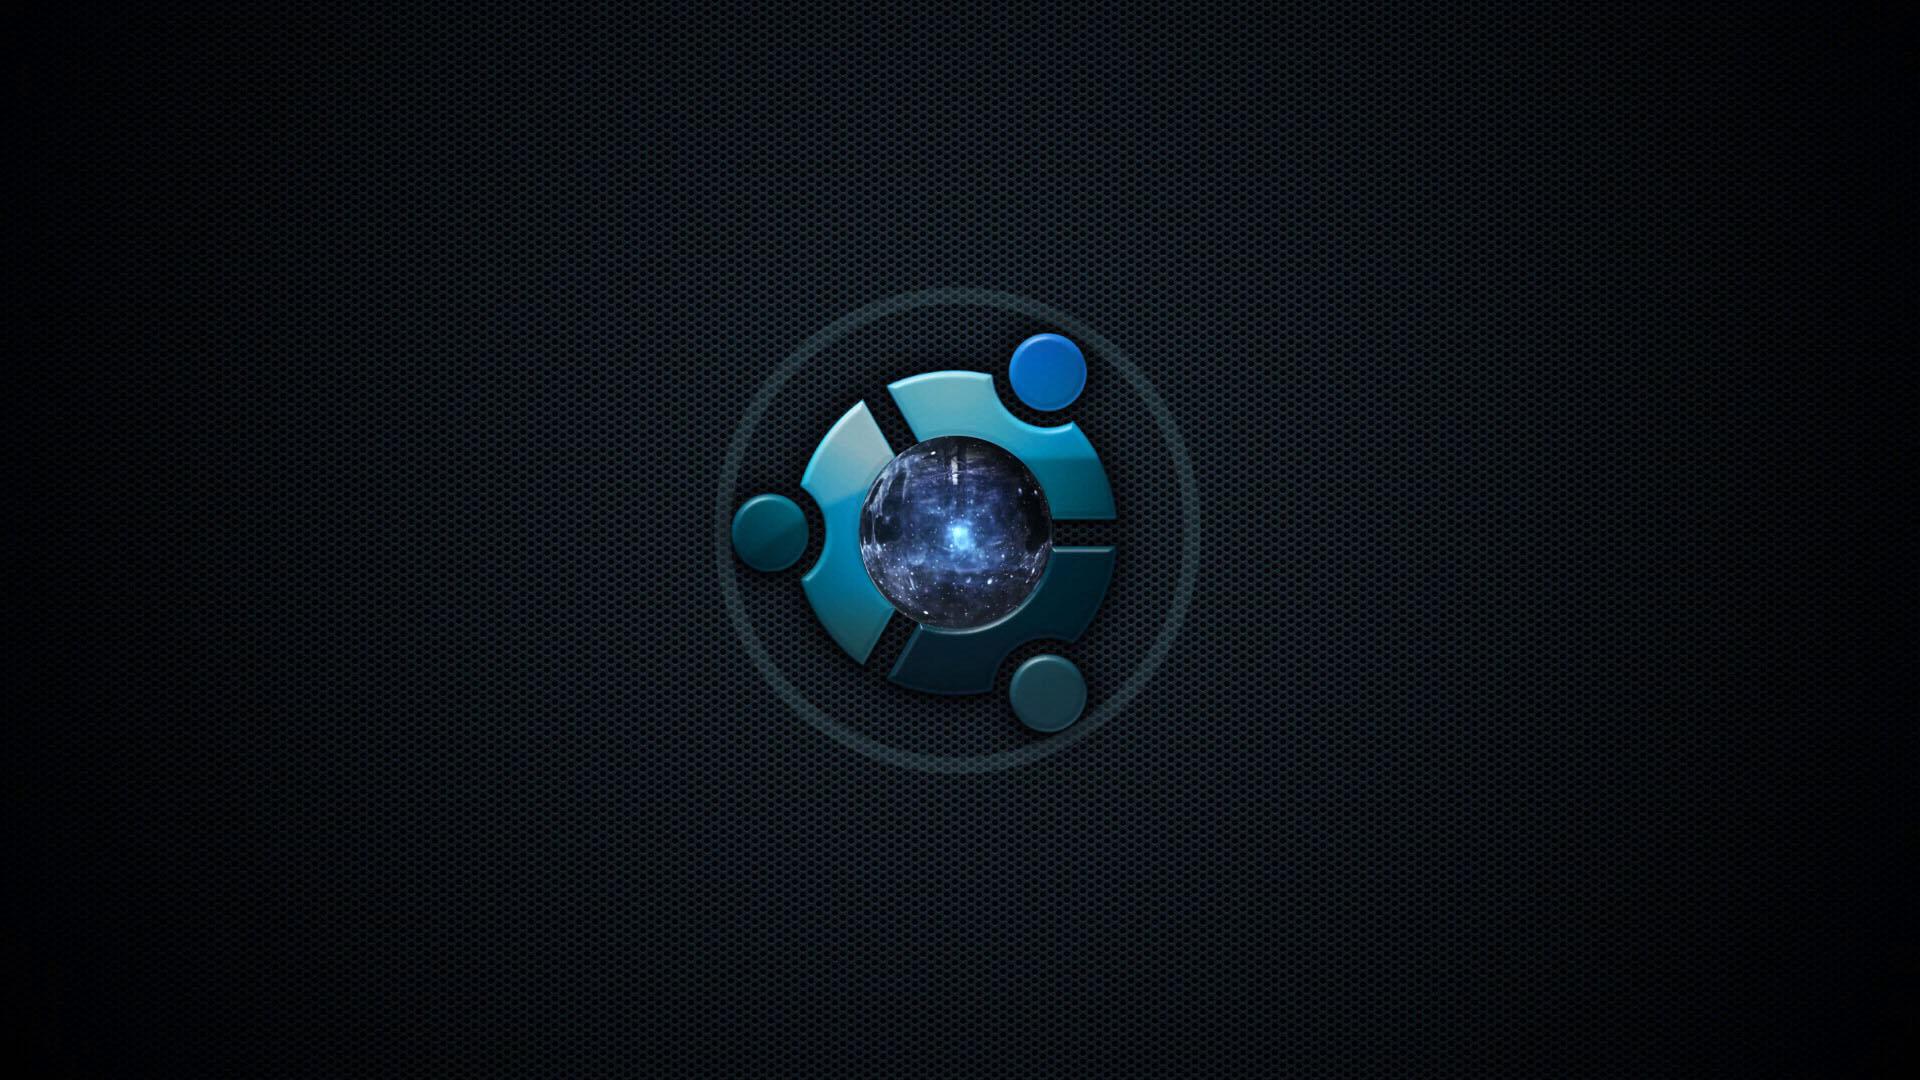 Ubuntu Blue wallpaper 263584 1920x1080